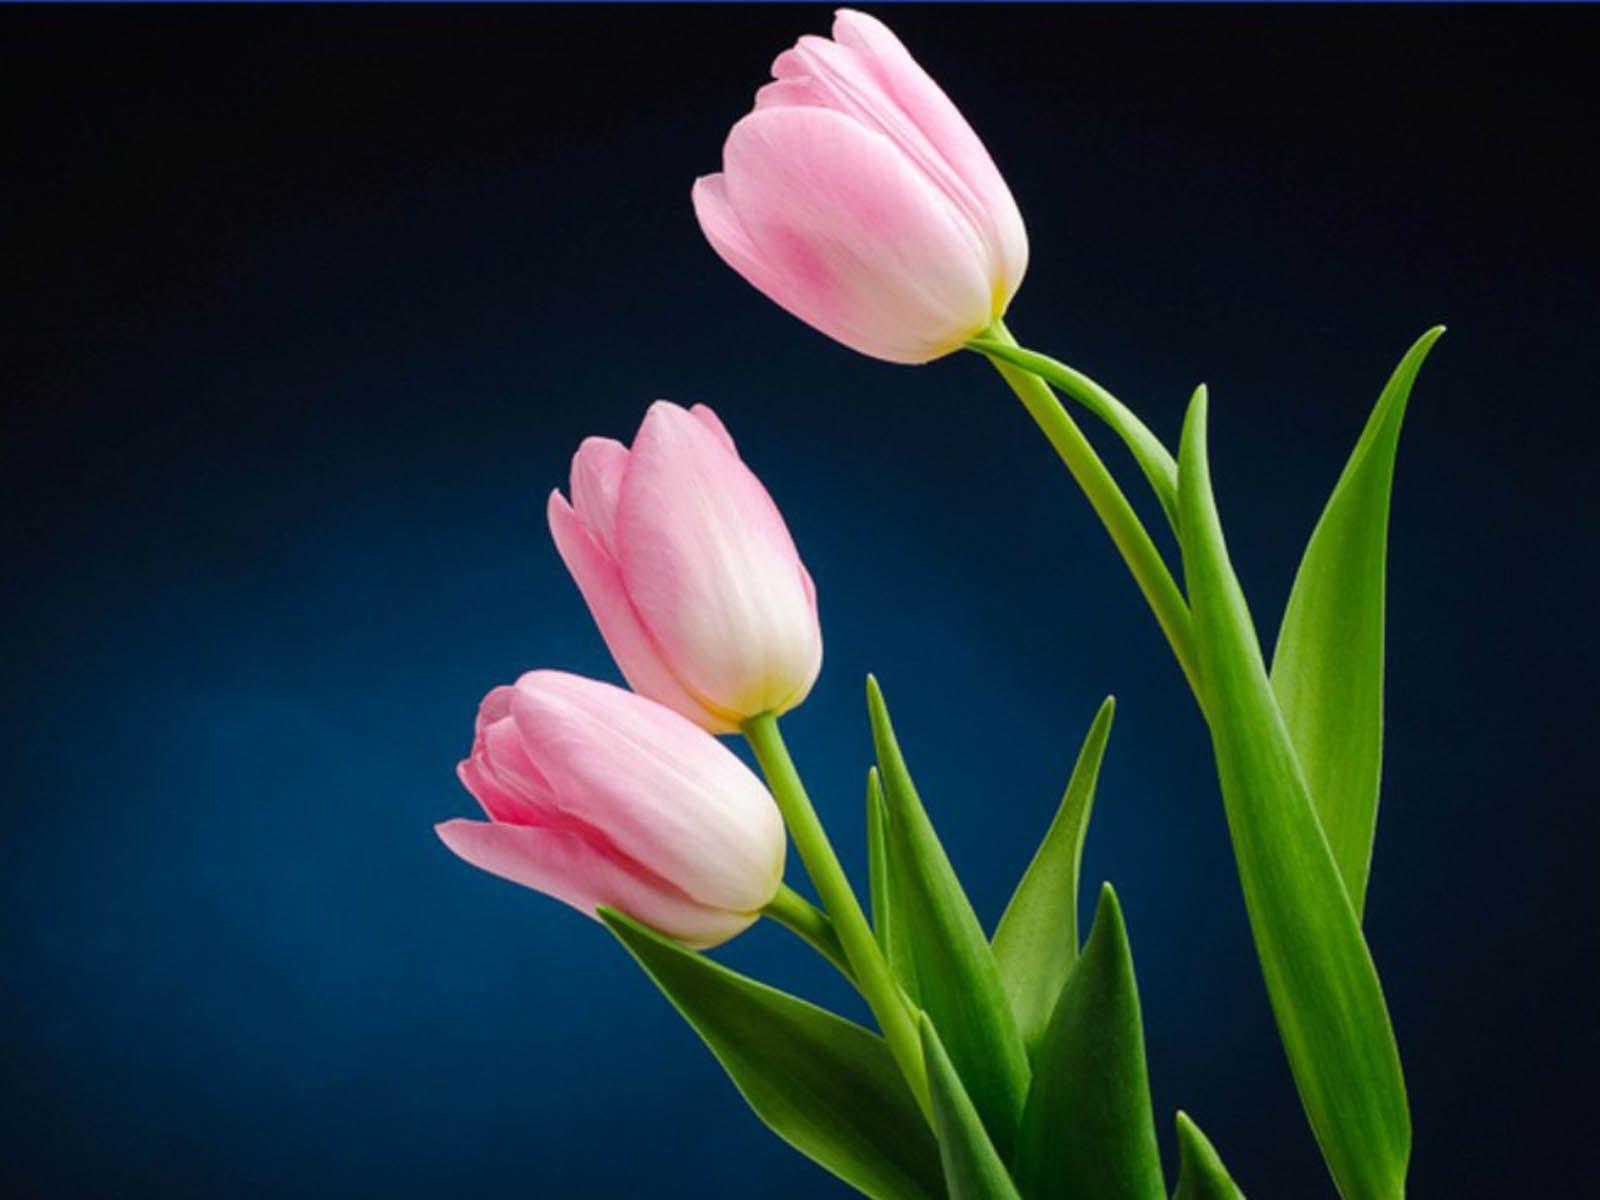 bright colored tulip wallpaper for your desktop naldz graphics